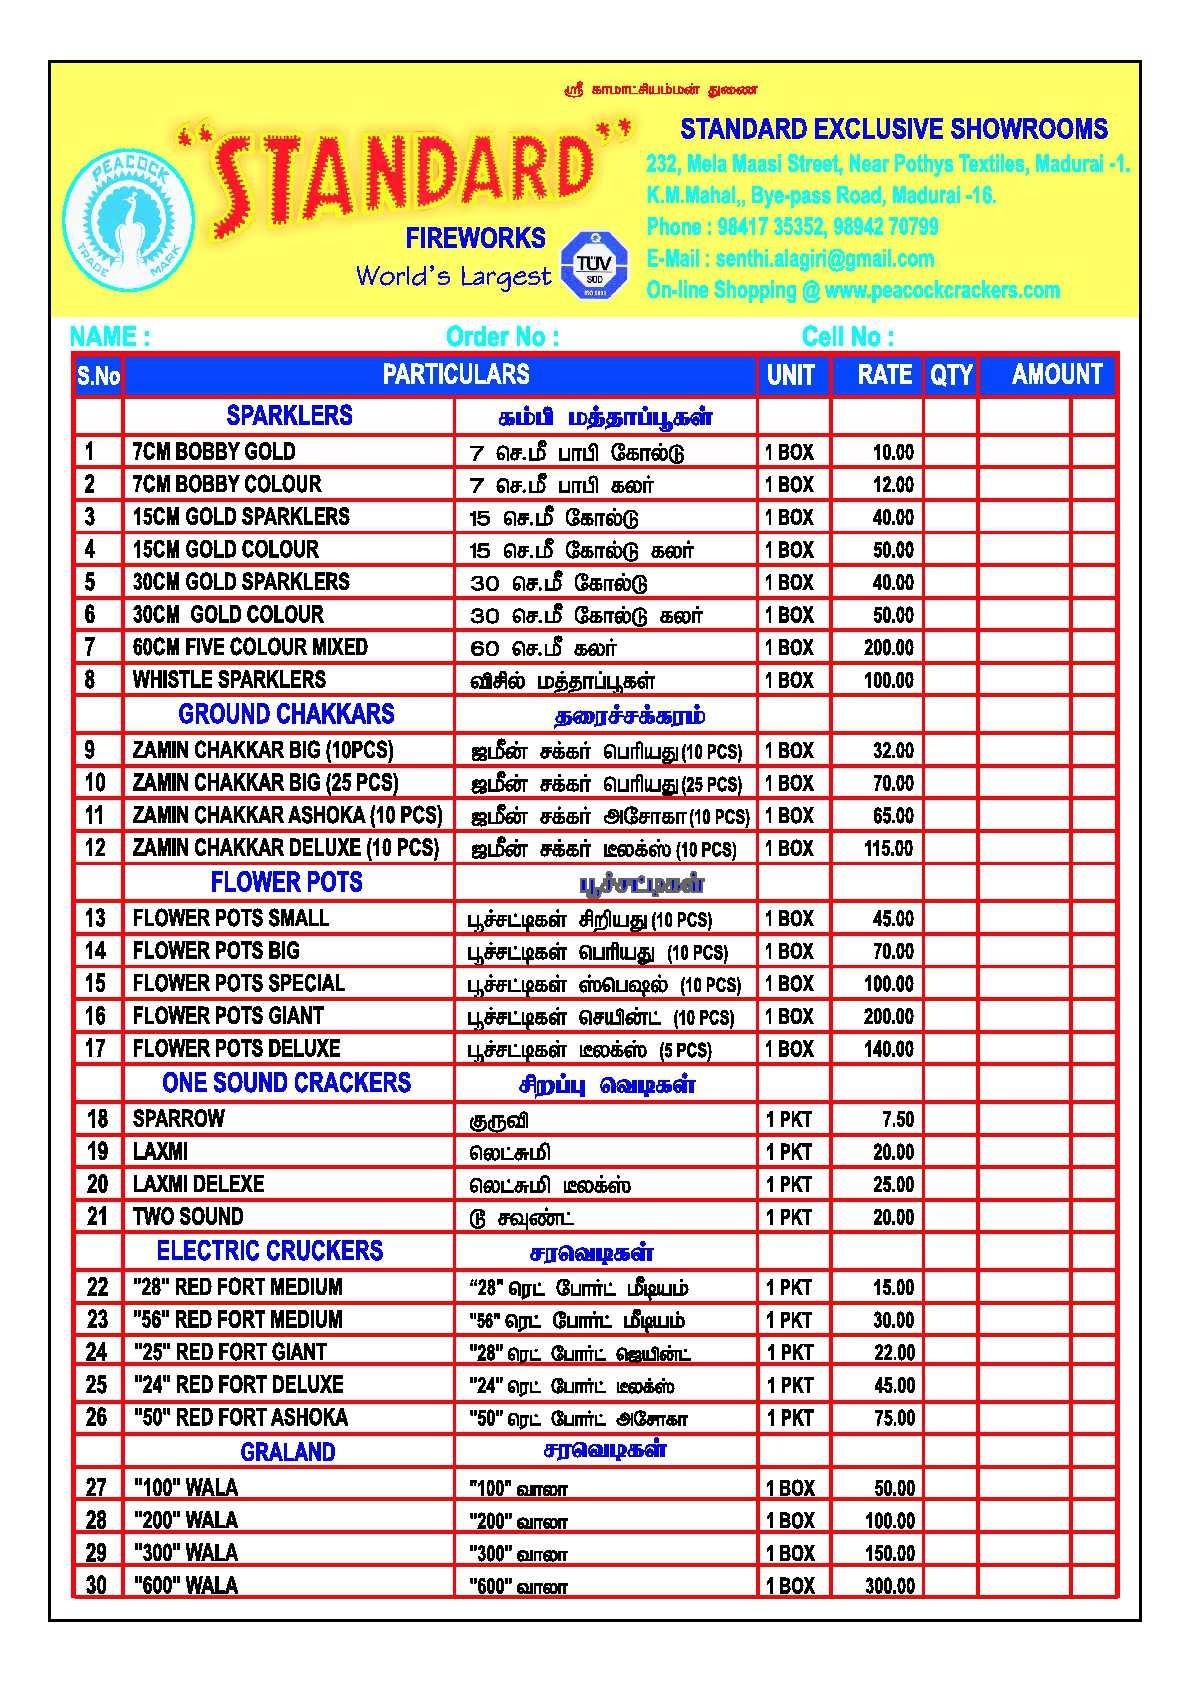 standard fireworks price list 2016 pdf